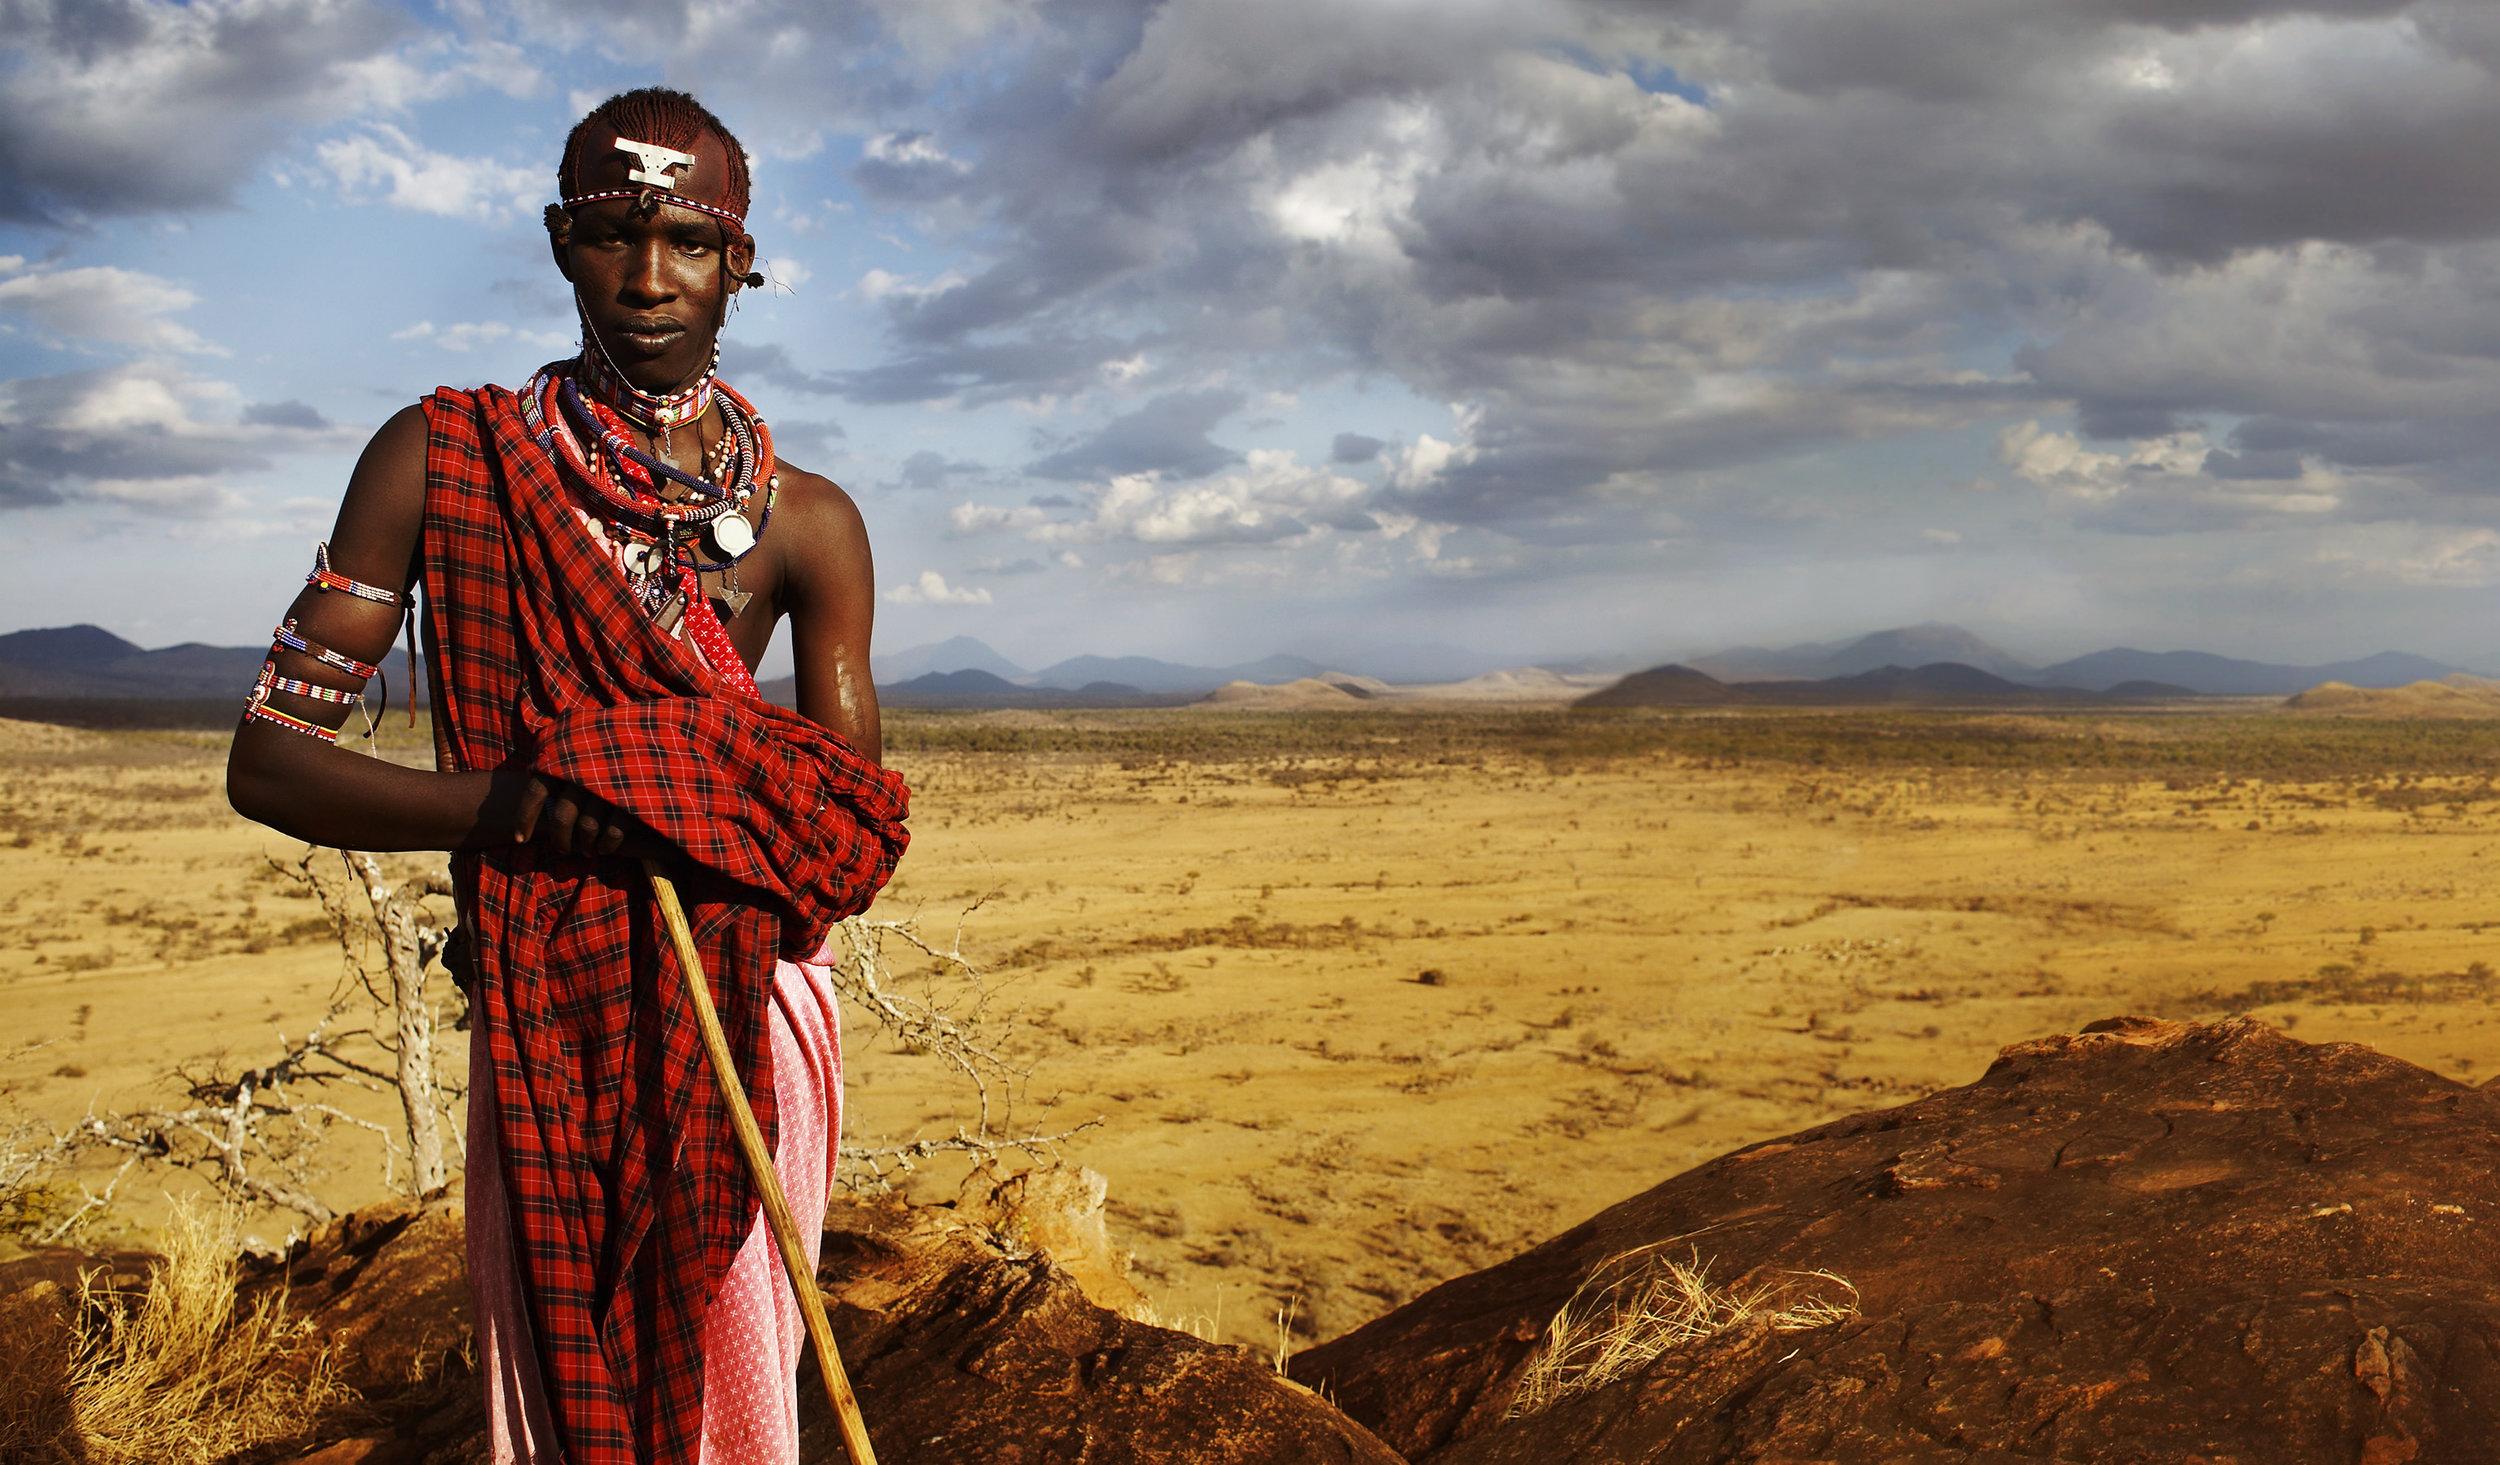 Maasai_infinity1.jpg